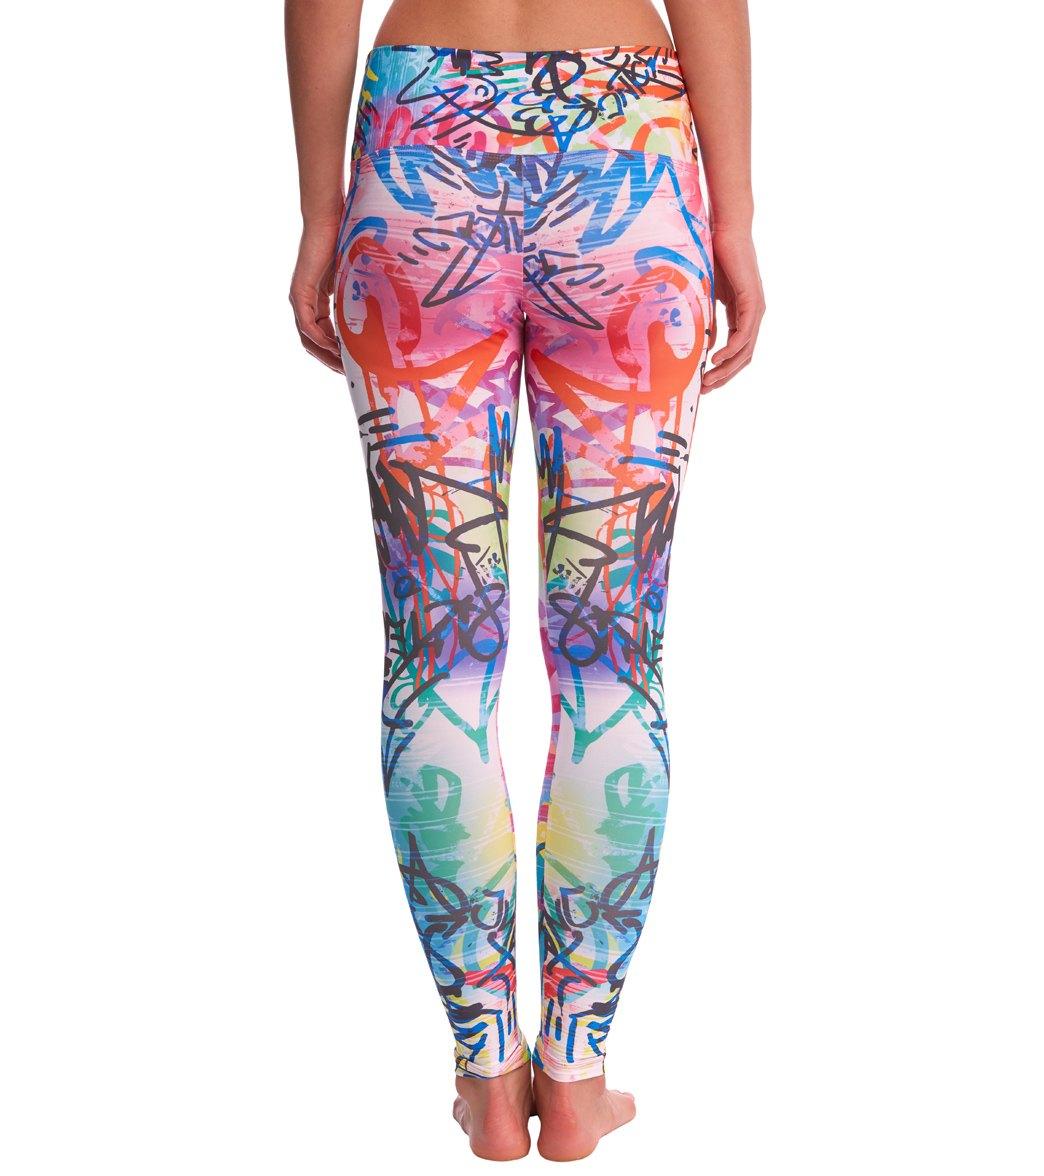 805e38933b297 Om Shanti Clothing Wicked Graffiti Eco Yoga Leggings at YogaOutlet ...